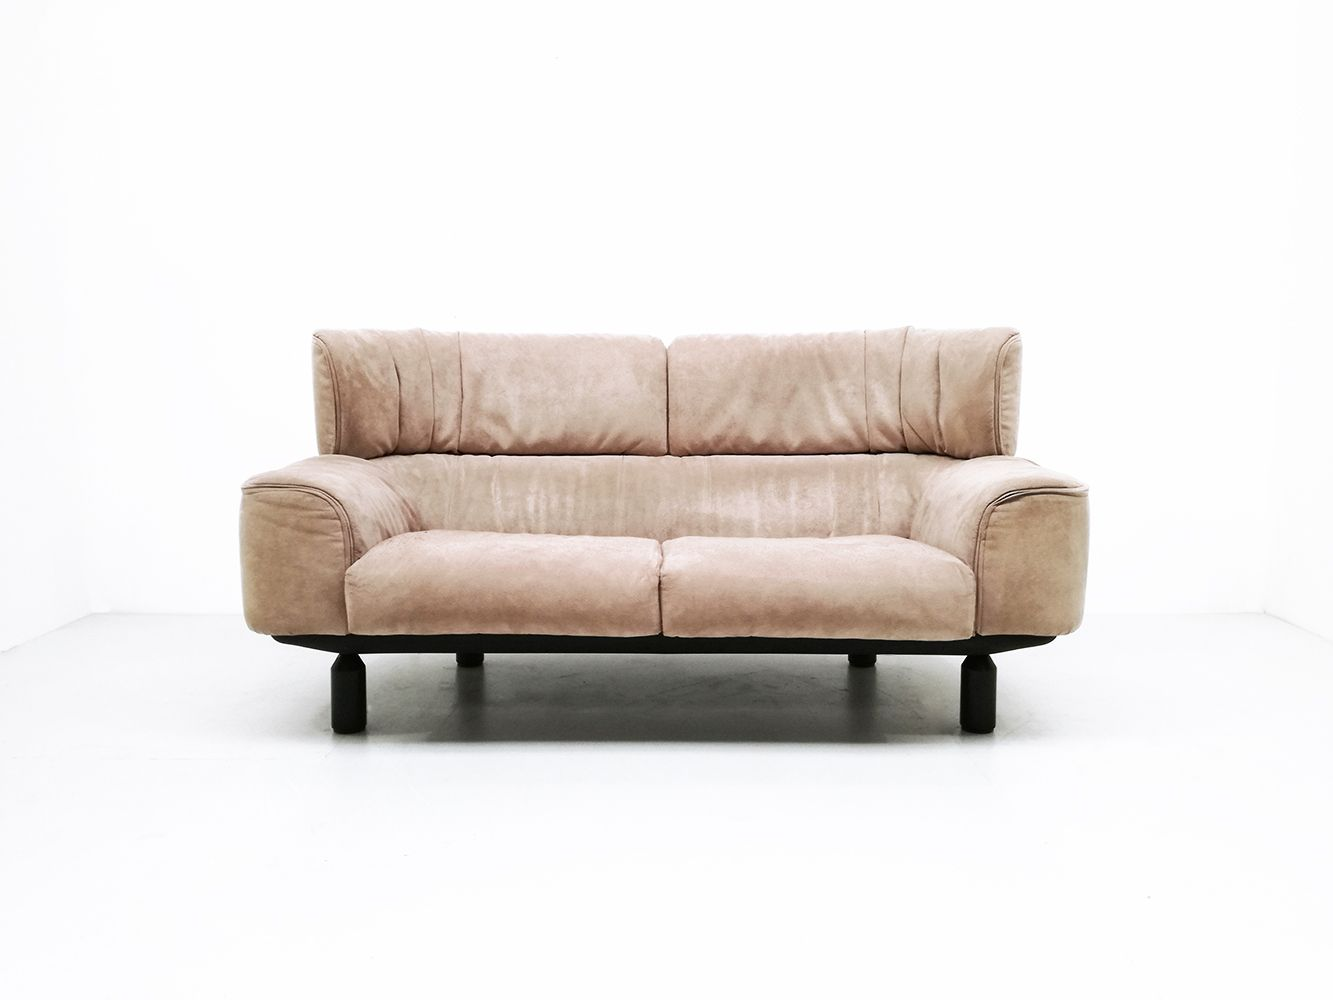 bull sofa von gianfranco frattini f r cassina 1987 bei pamono kaufen. Black Bedroom Furniture Sets. Home Design Ideas